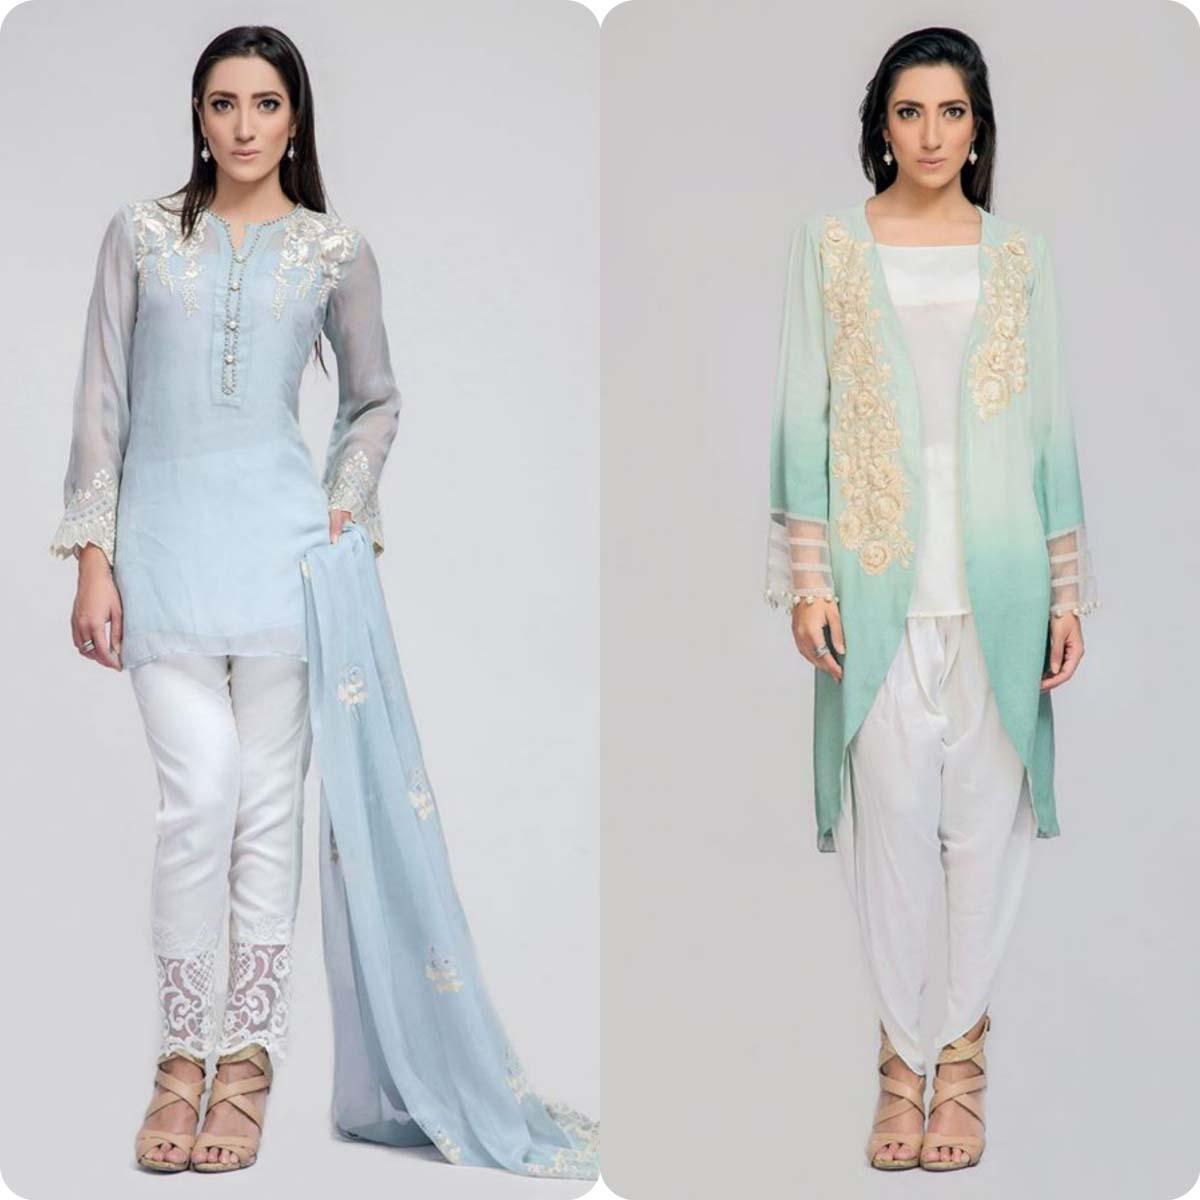 Deepak perwani Luxury Pret Eid Collection for Men and Women 2016-2017 (1)